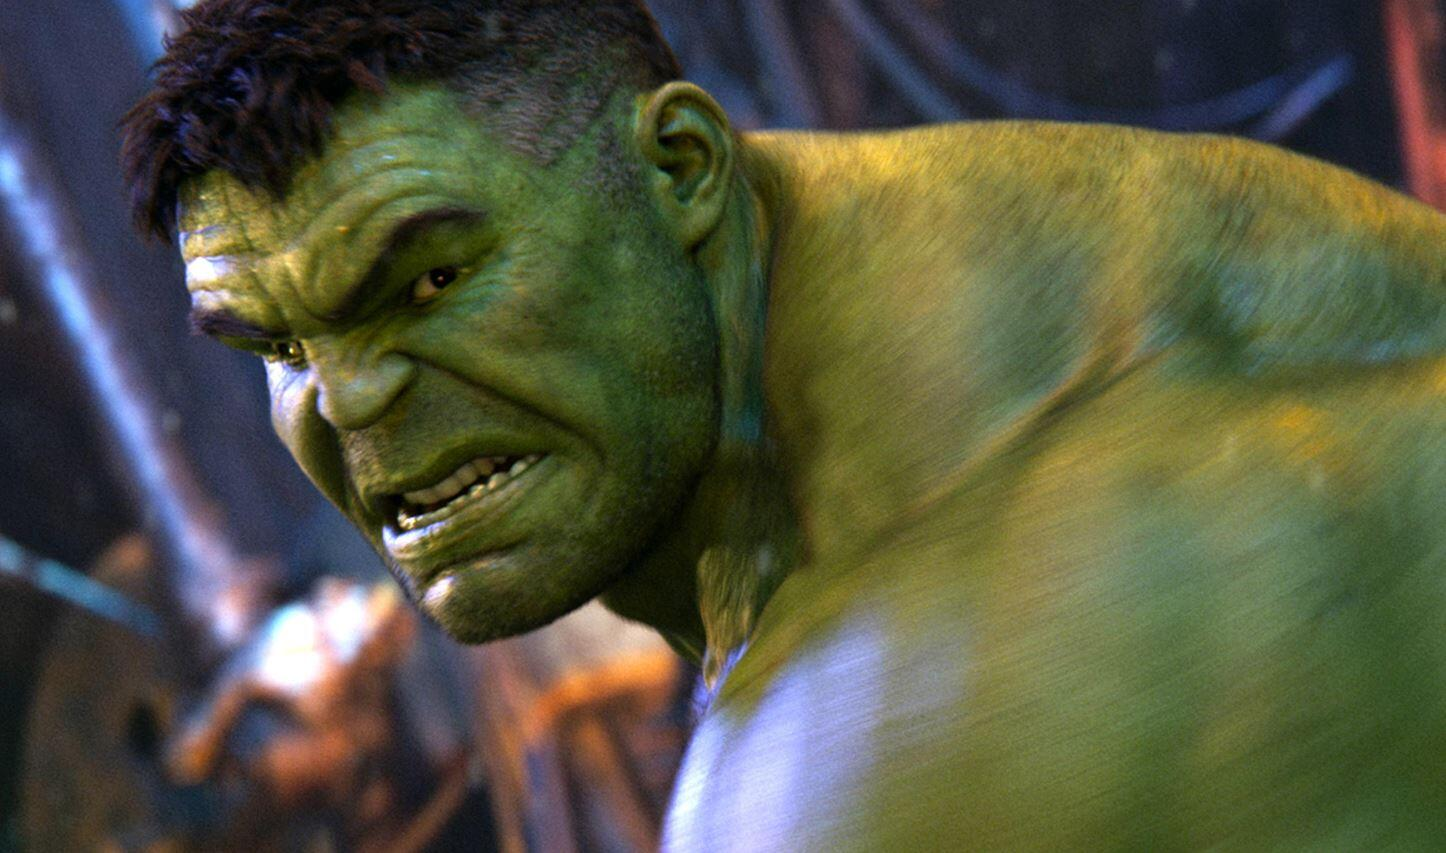 Avengers: Endgame Mark Ruffalo